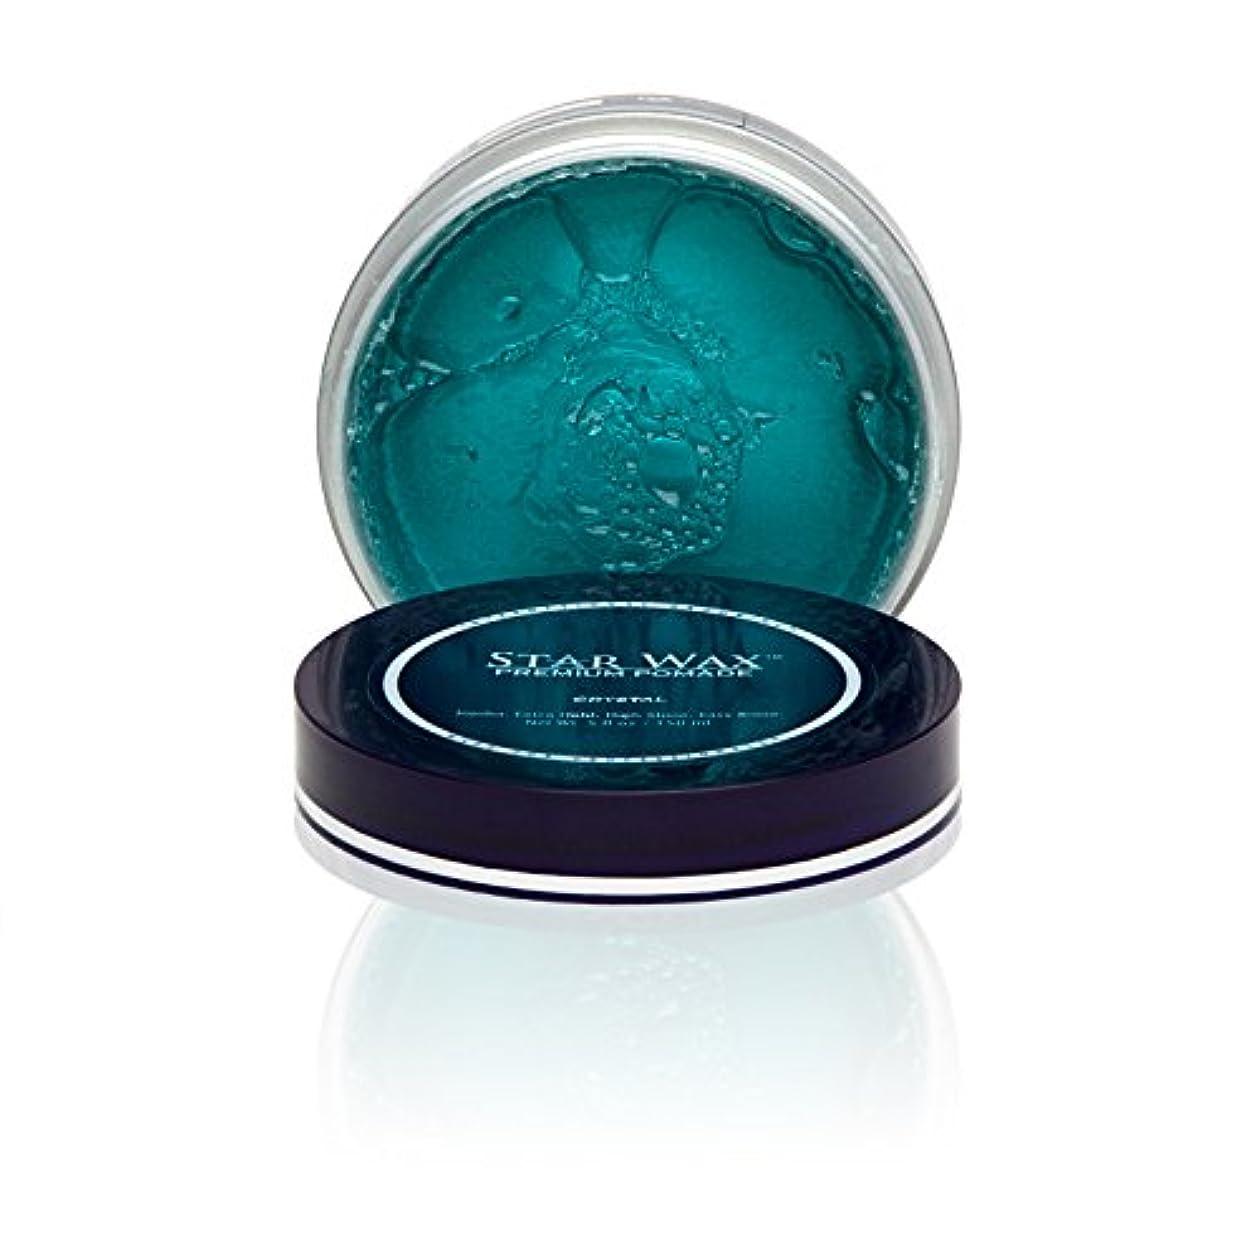 Star Wax | Premium Pomade, Crystal(スターワックスプレミアム ポマード「クリスタル」)?Star Pro Line(スタープロライン)製?5(液量)オンス/150ml